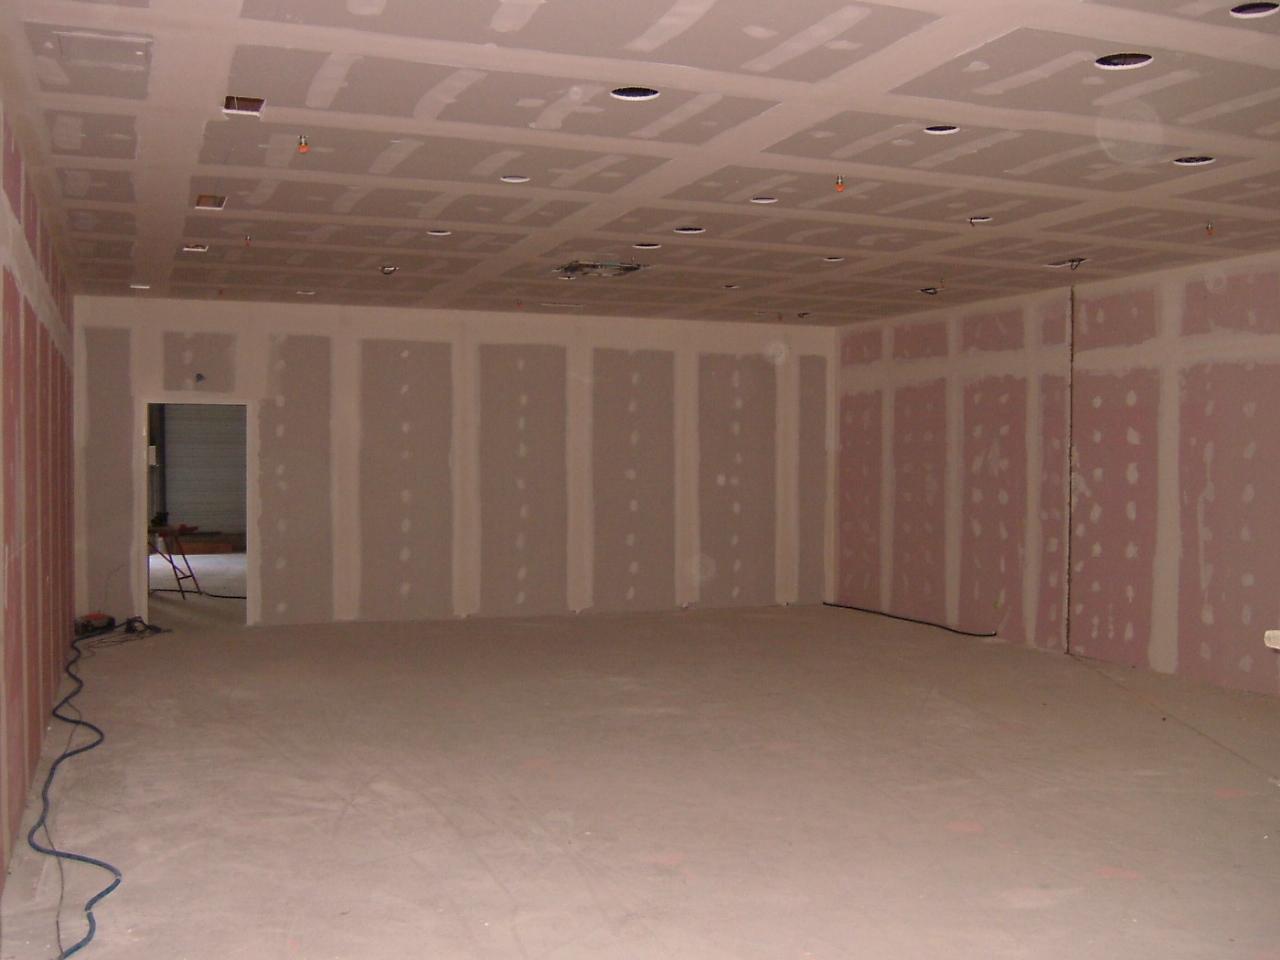 Eram cap vert bruz placo et plafond termin for Plafond combles placo